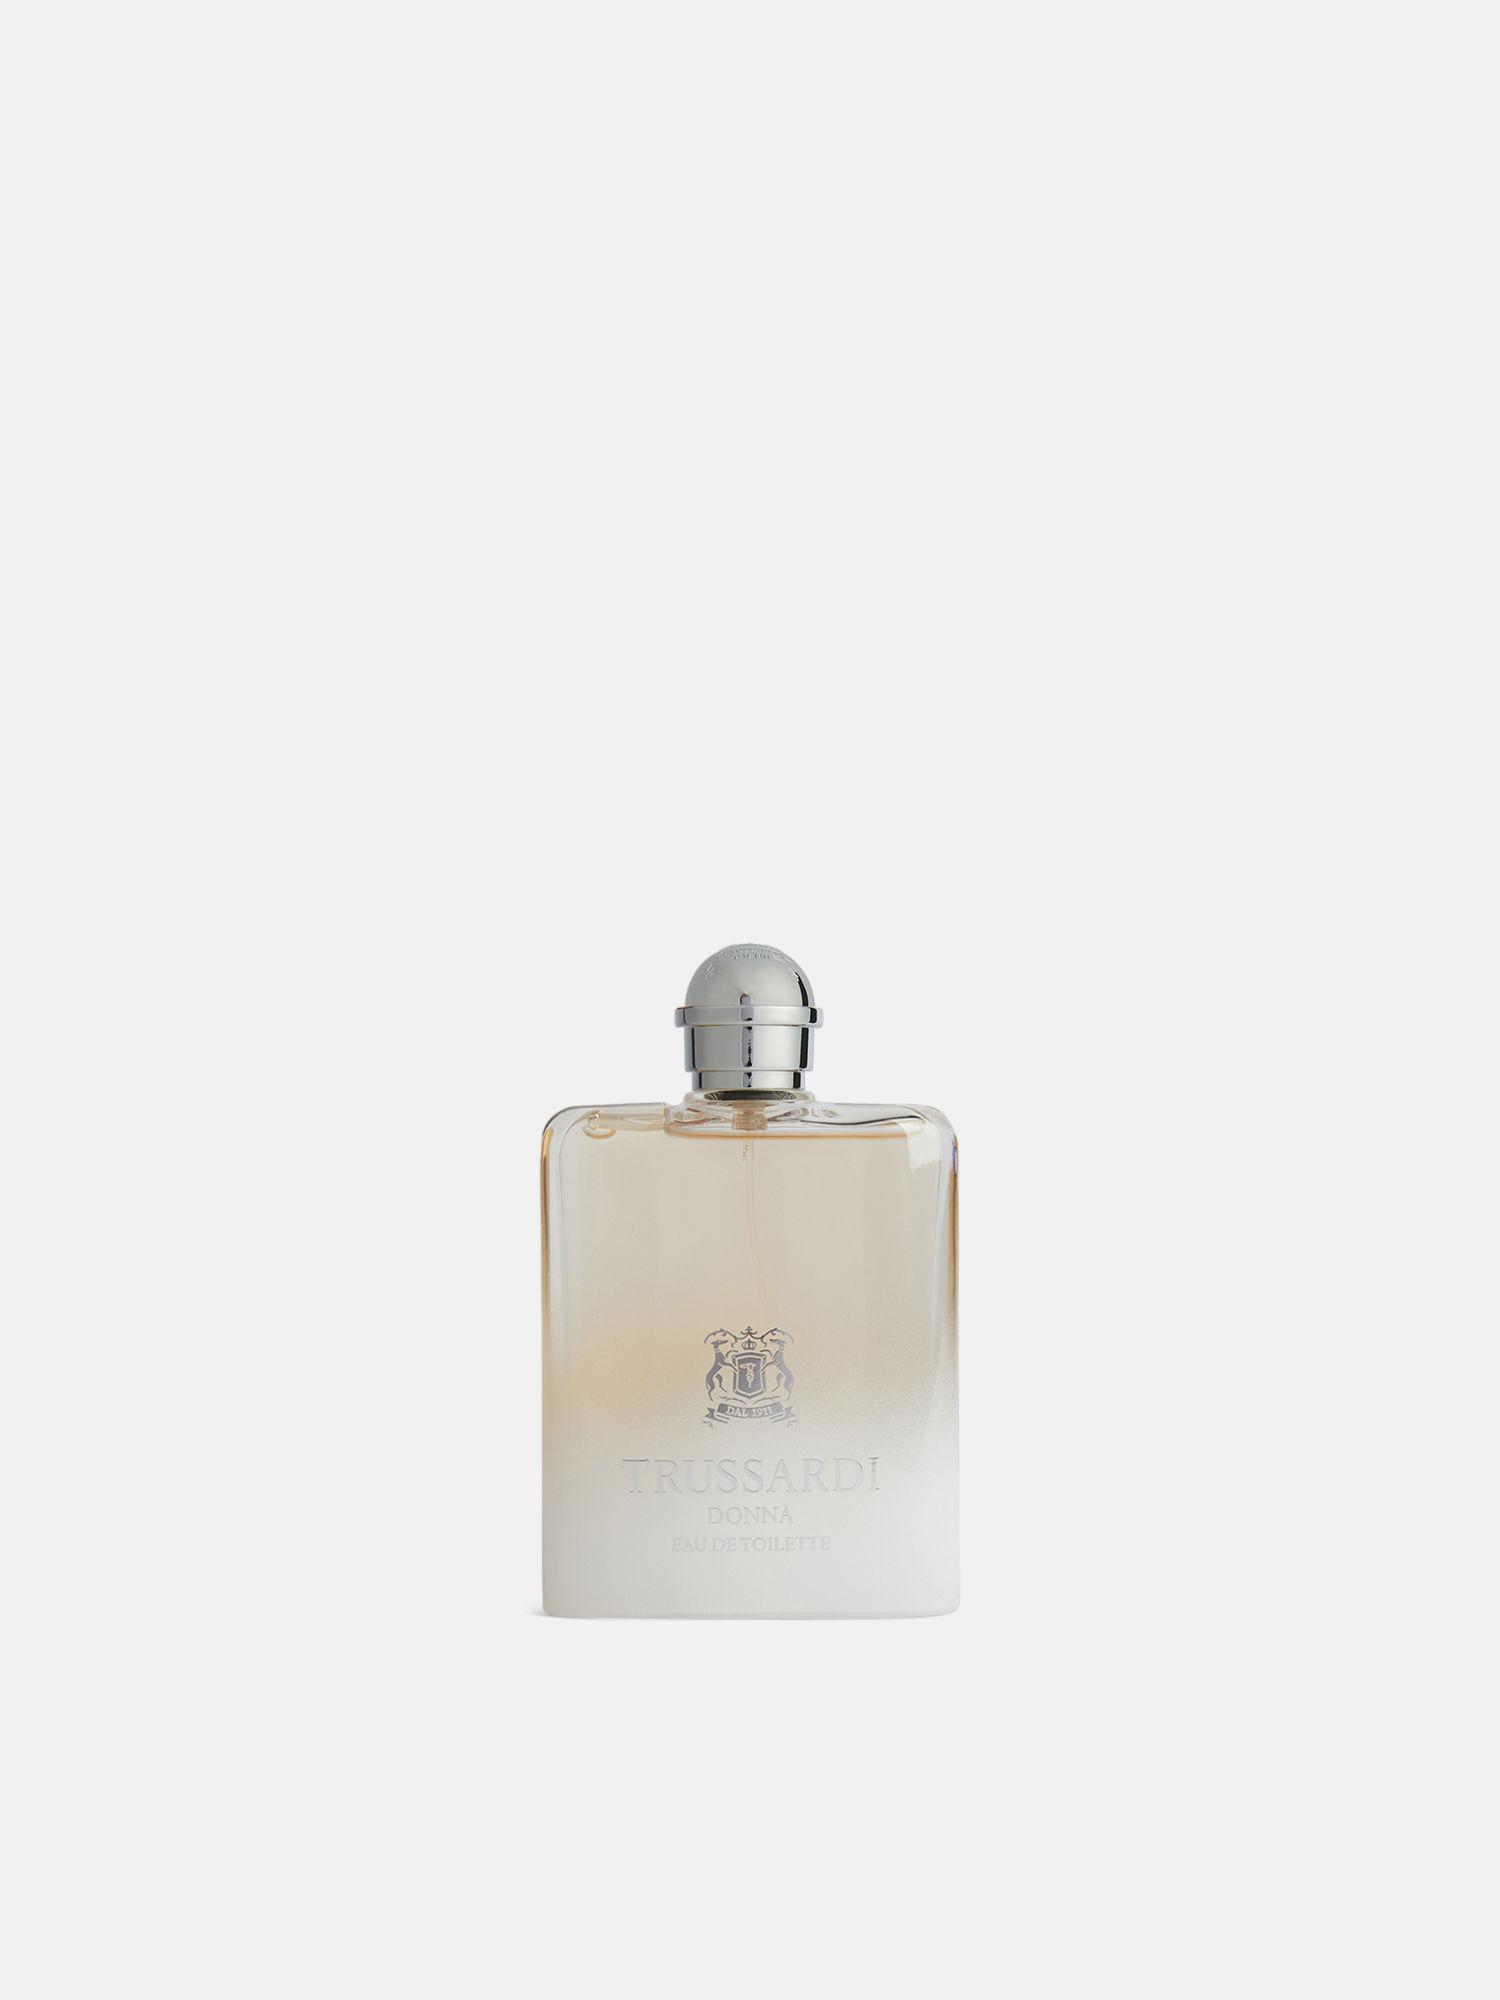 new product d1fff 0491c Trussardi-Donna-Eau-de-Toilette-100-ml TRUSSARDI 50 01 8011530015060 F.jpg